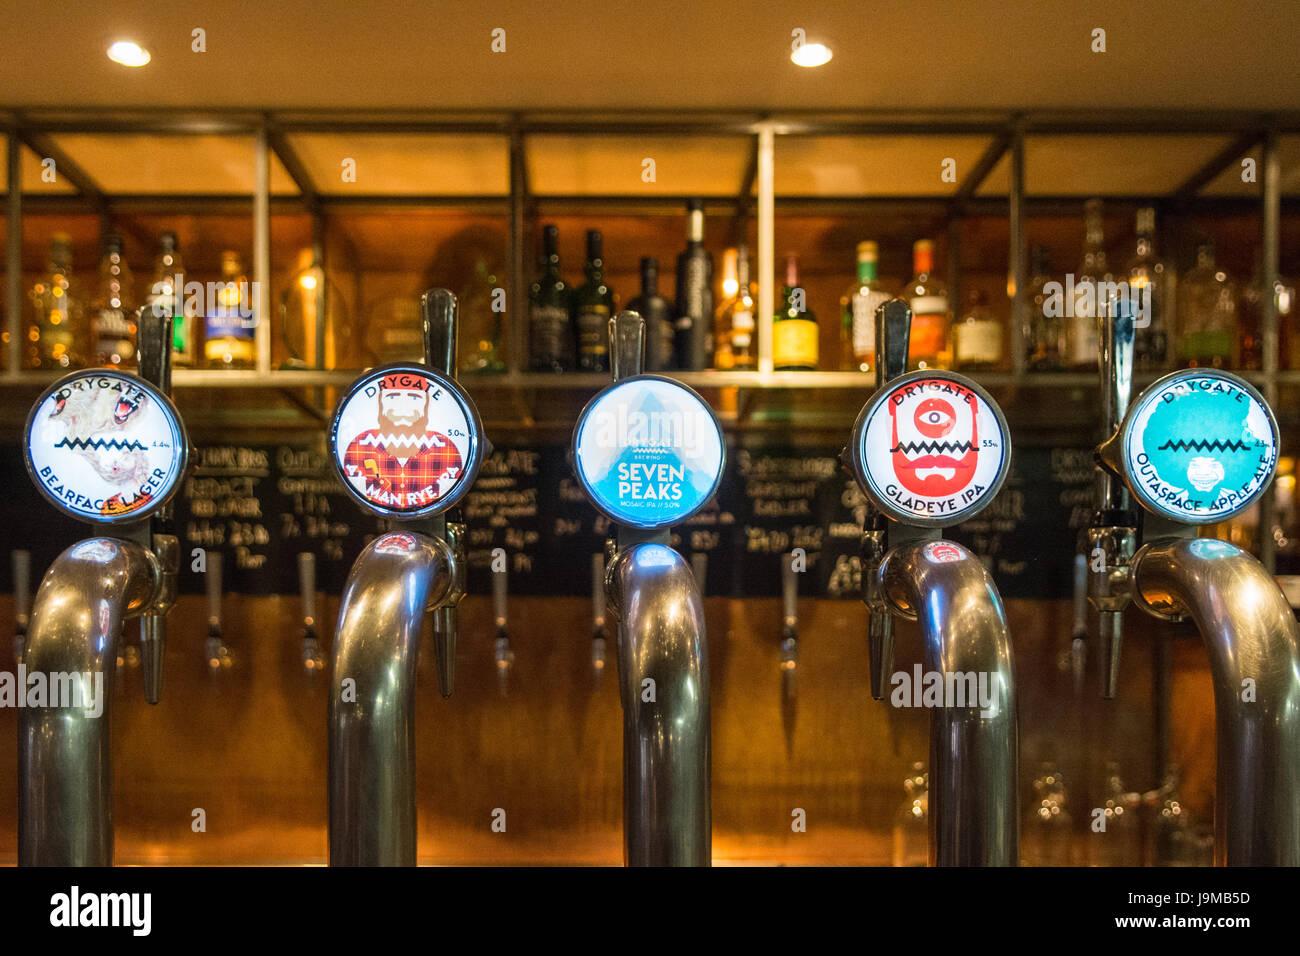 Drygate Brewery - Glasgow, Scotland, UK - Stock Image